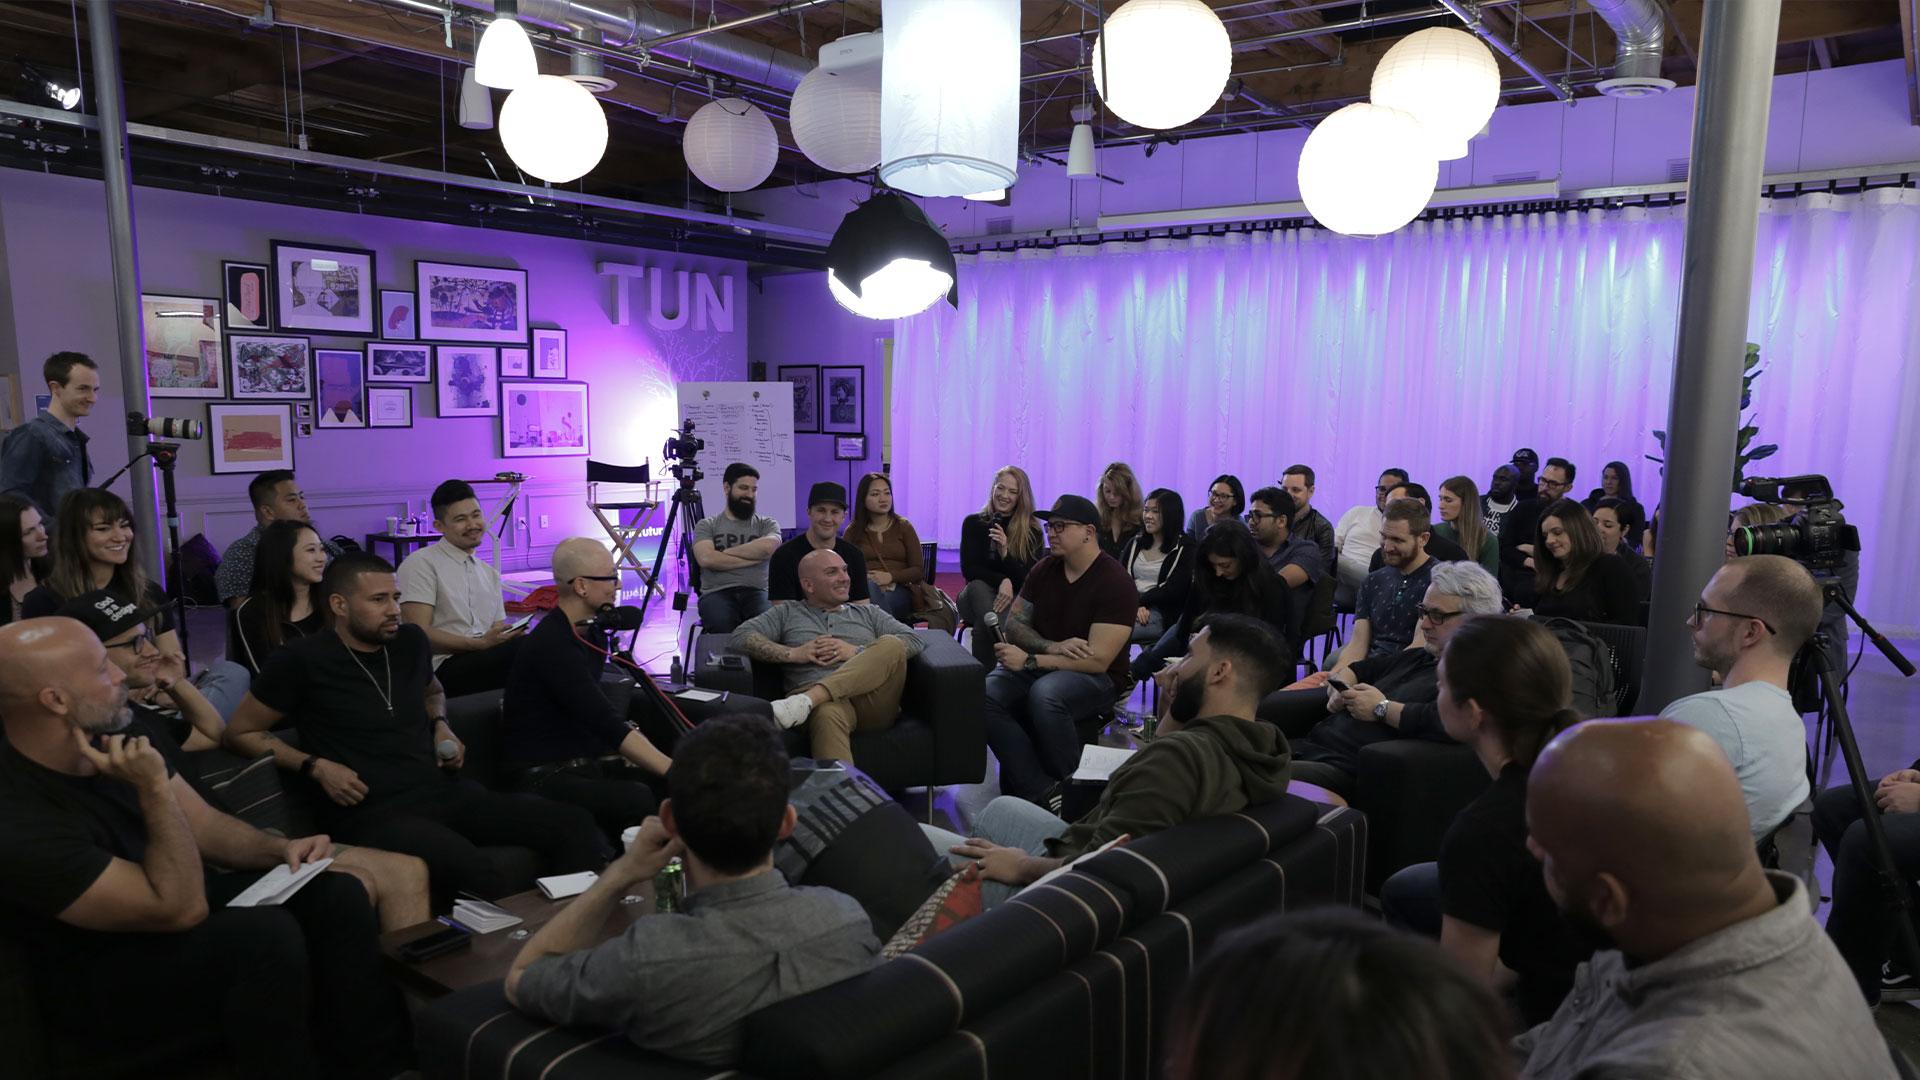 The futur pro group gathering